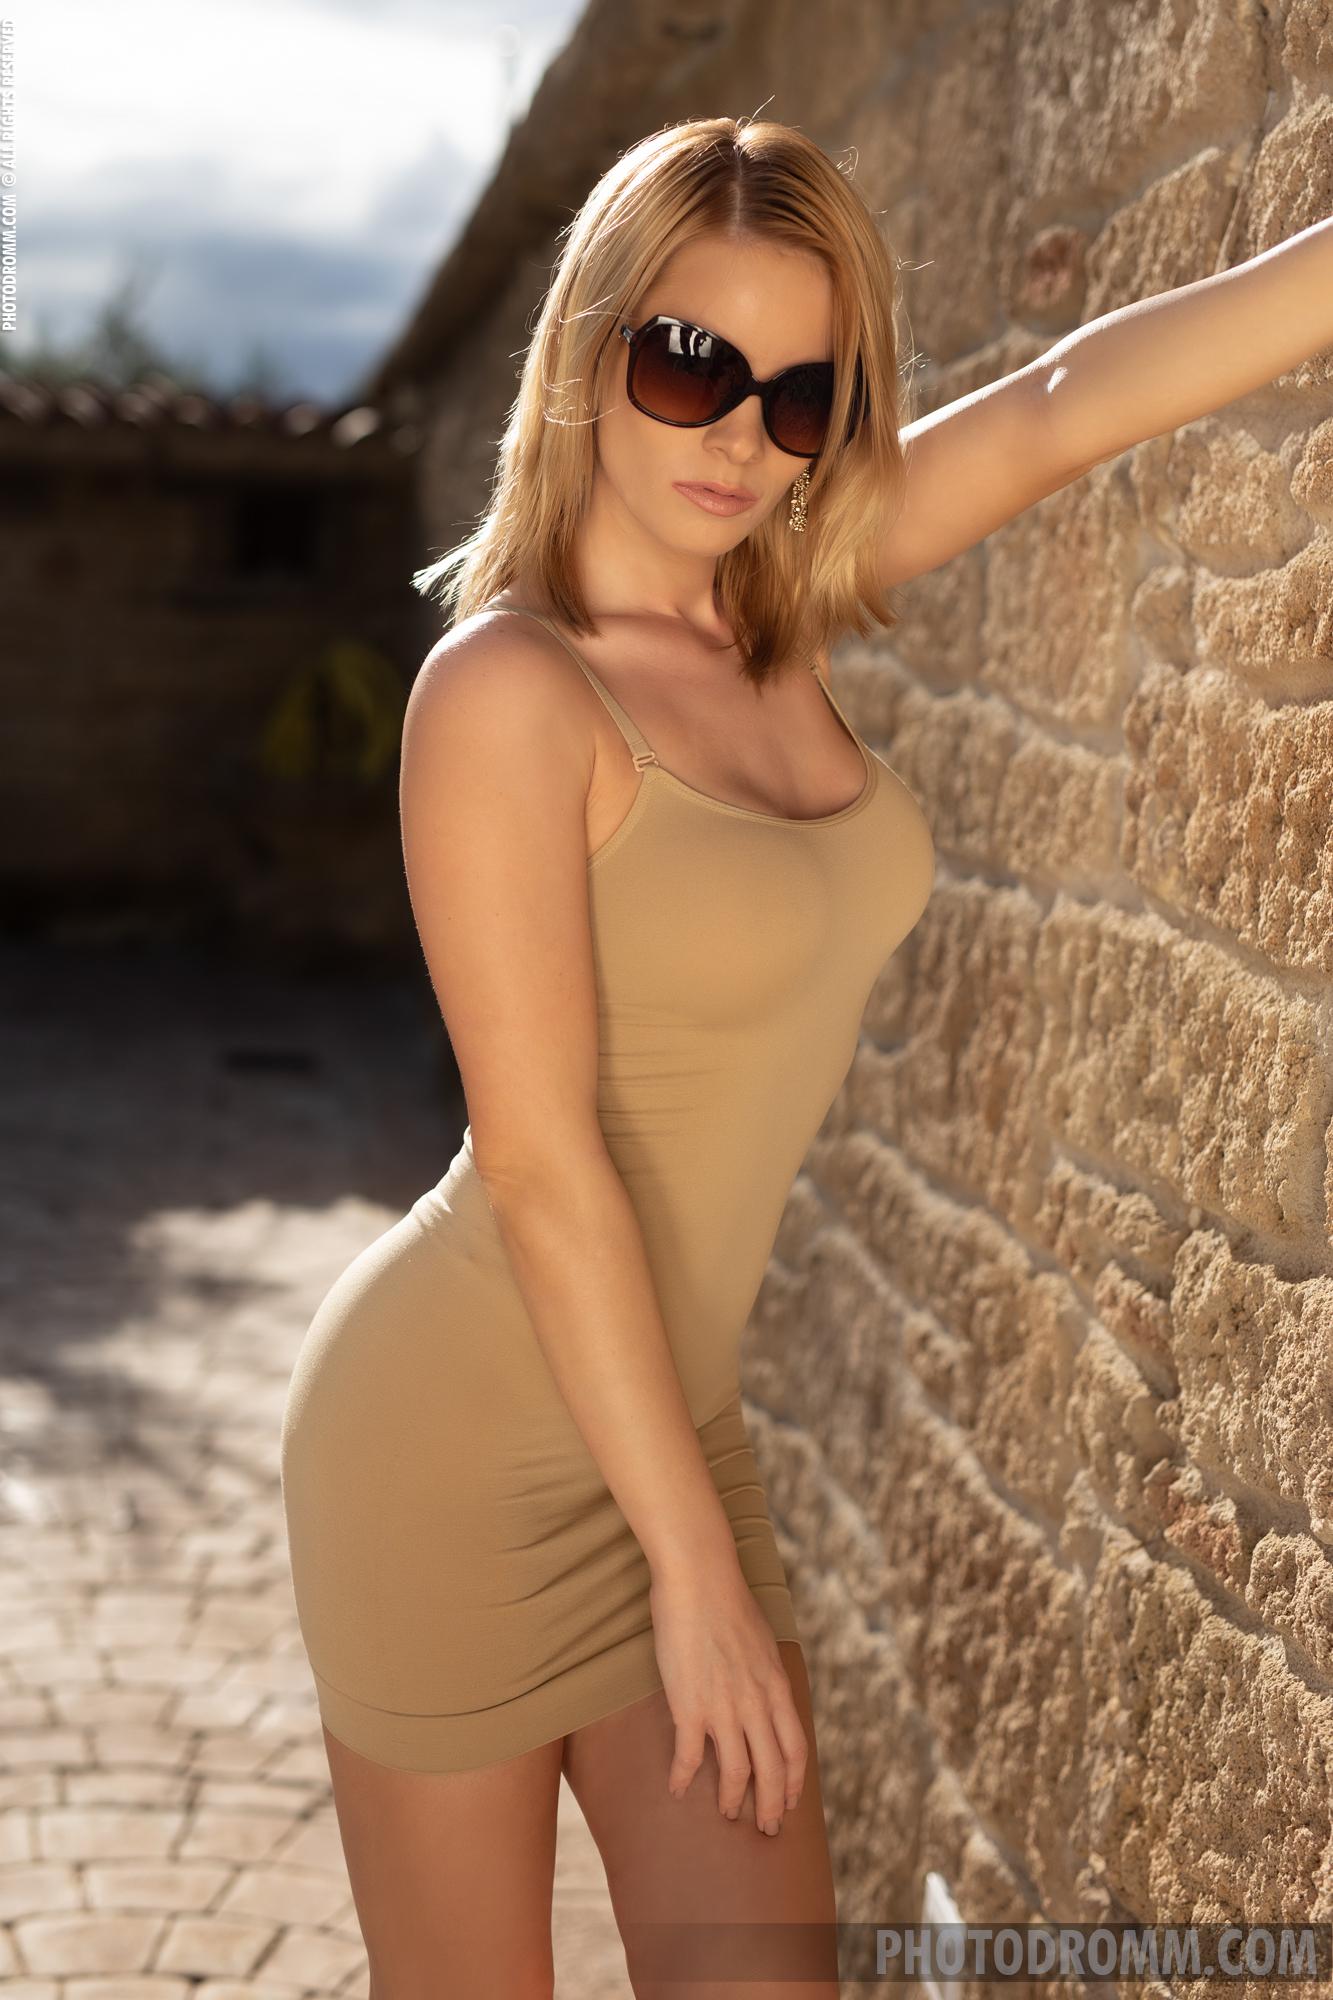 Brooke Big Tit Blonde in Tight Minidress for Photodromm